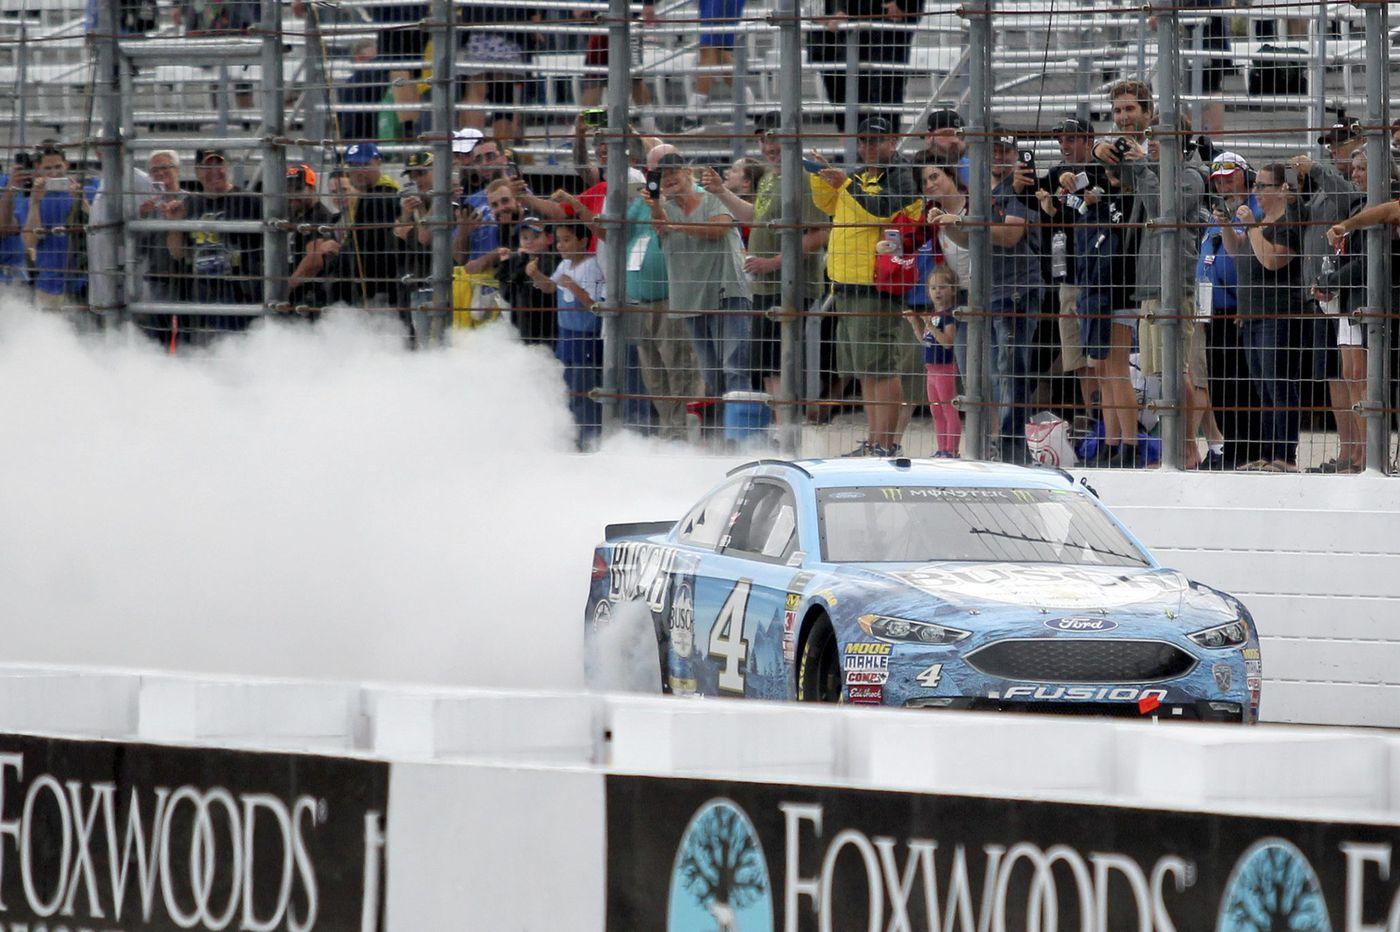 After Kevin Harvick's taps, NASCAR picks up at Pocono